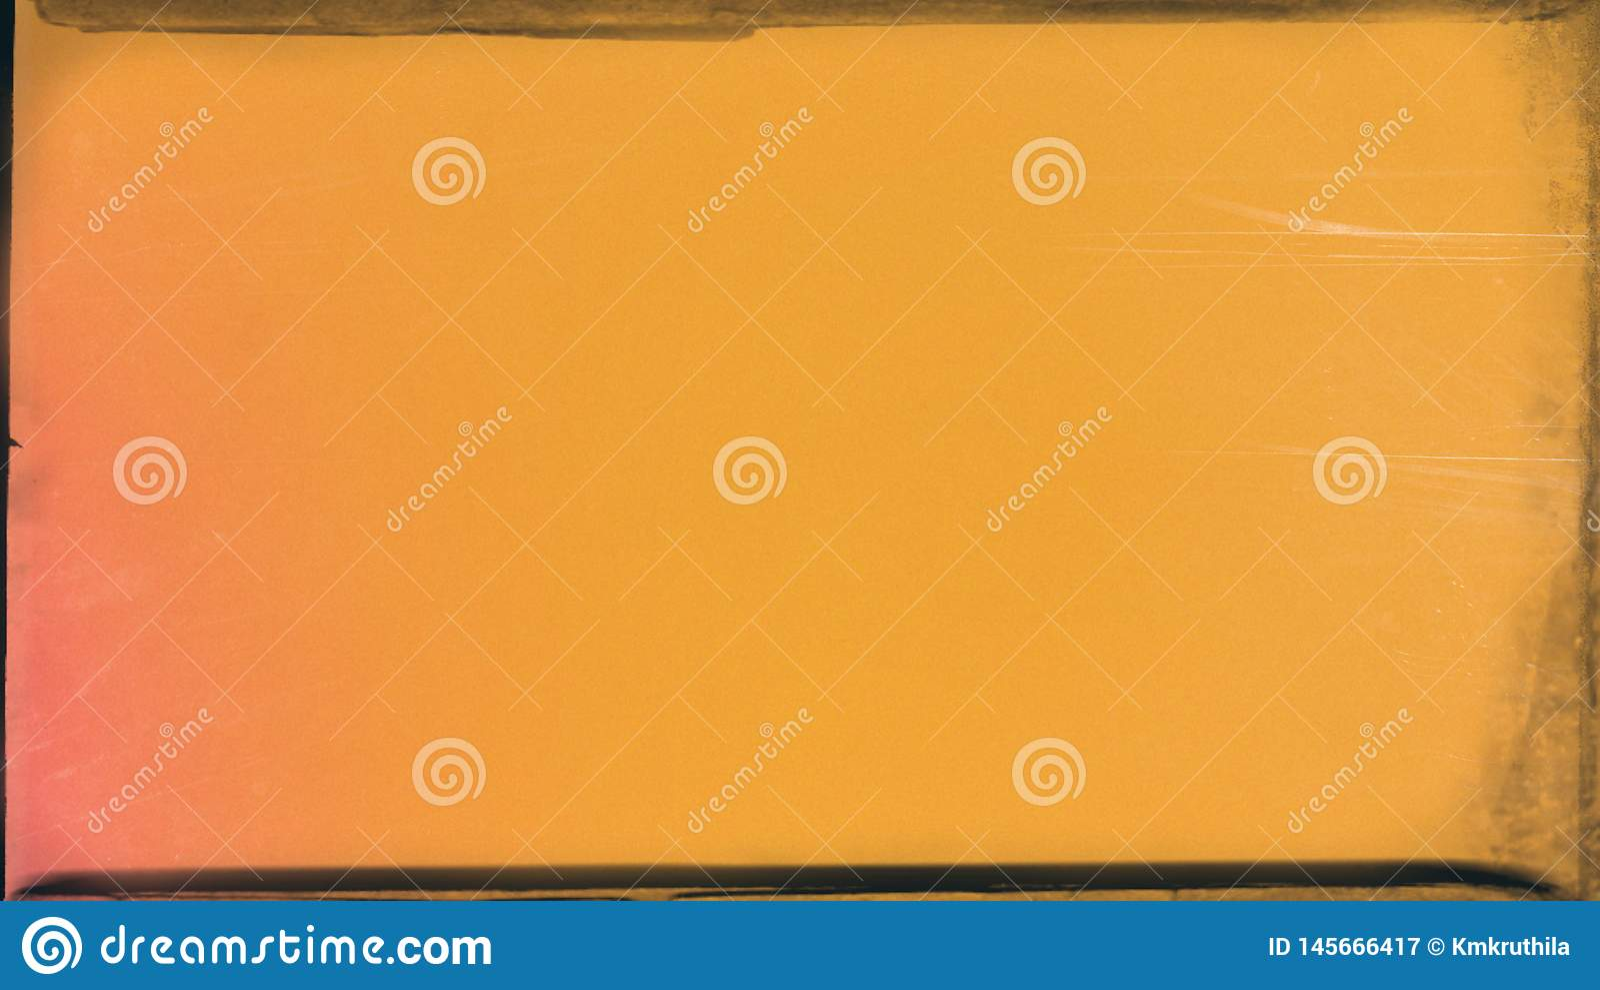 Orange Yellow Paper Beautiful elegant Illustration graphic art design Background